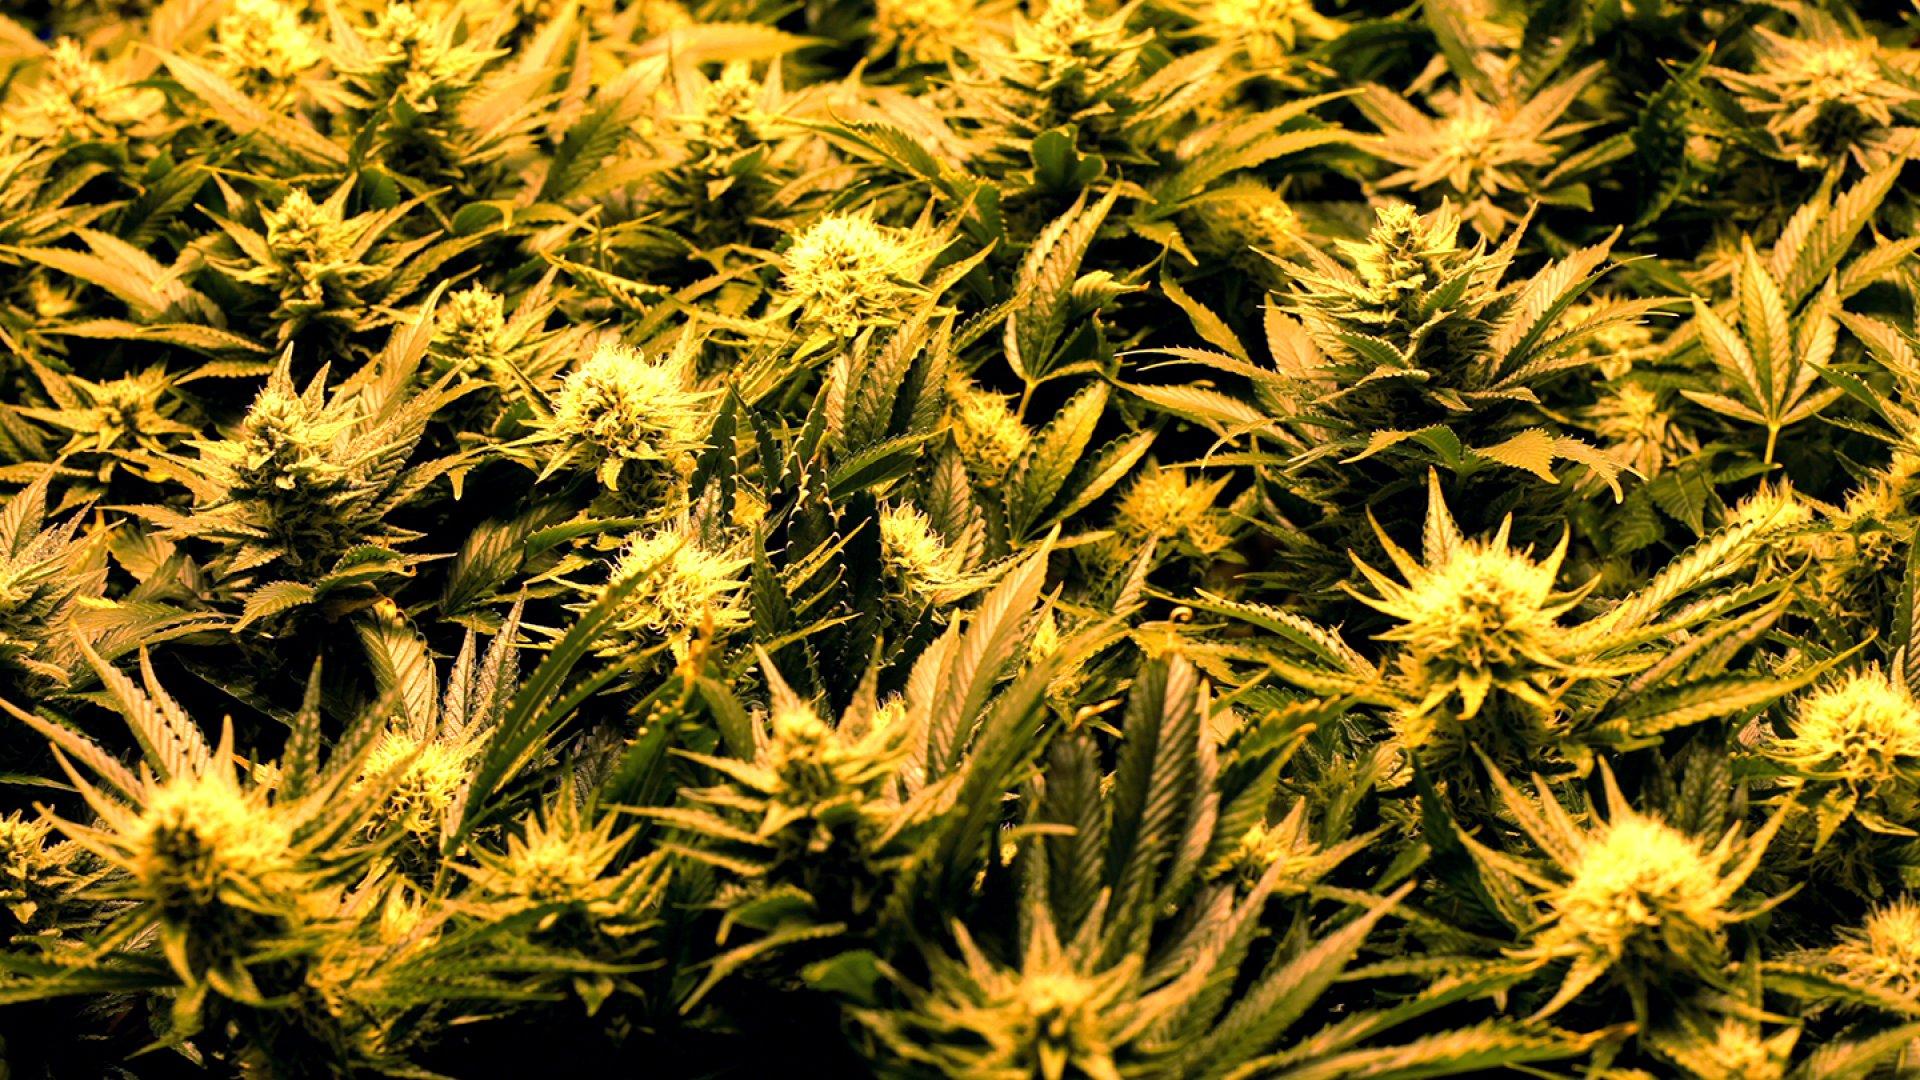 A close up of marijuana growing inside a Denver cultivation center.